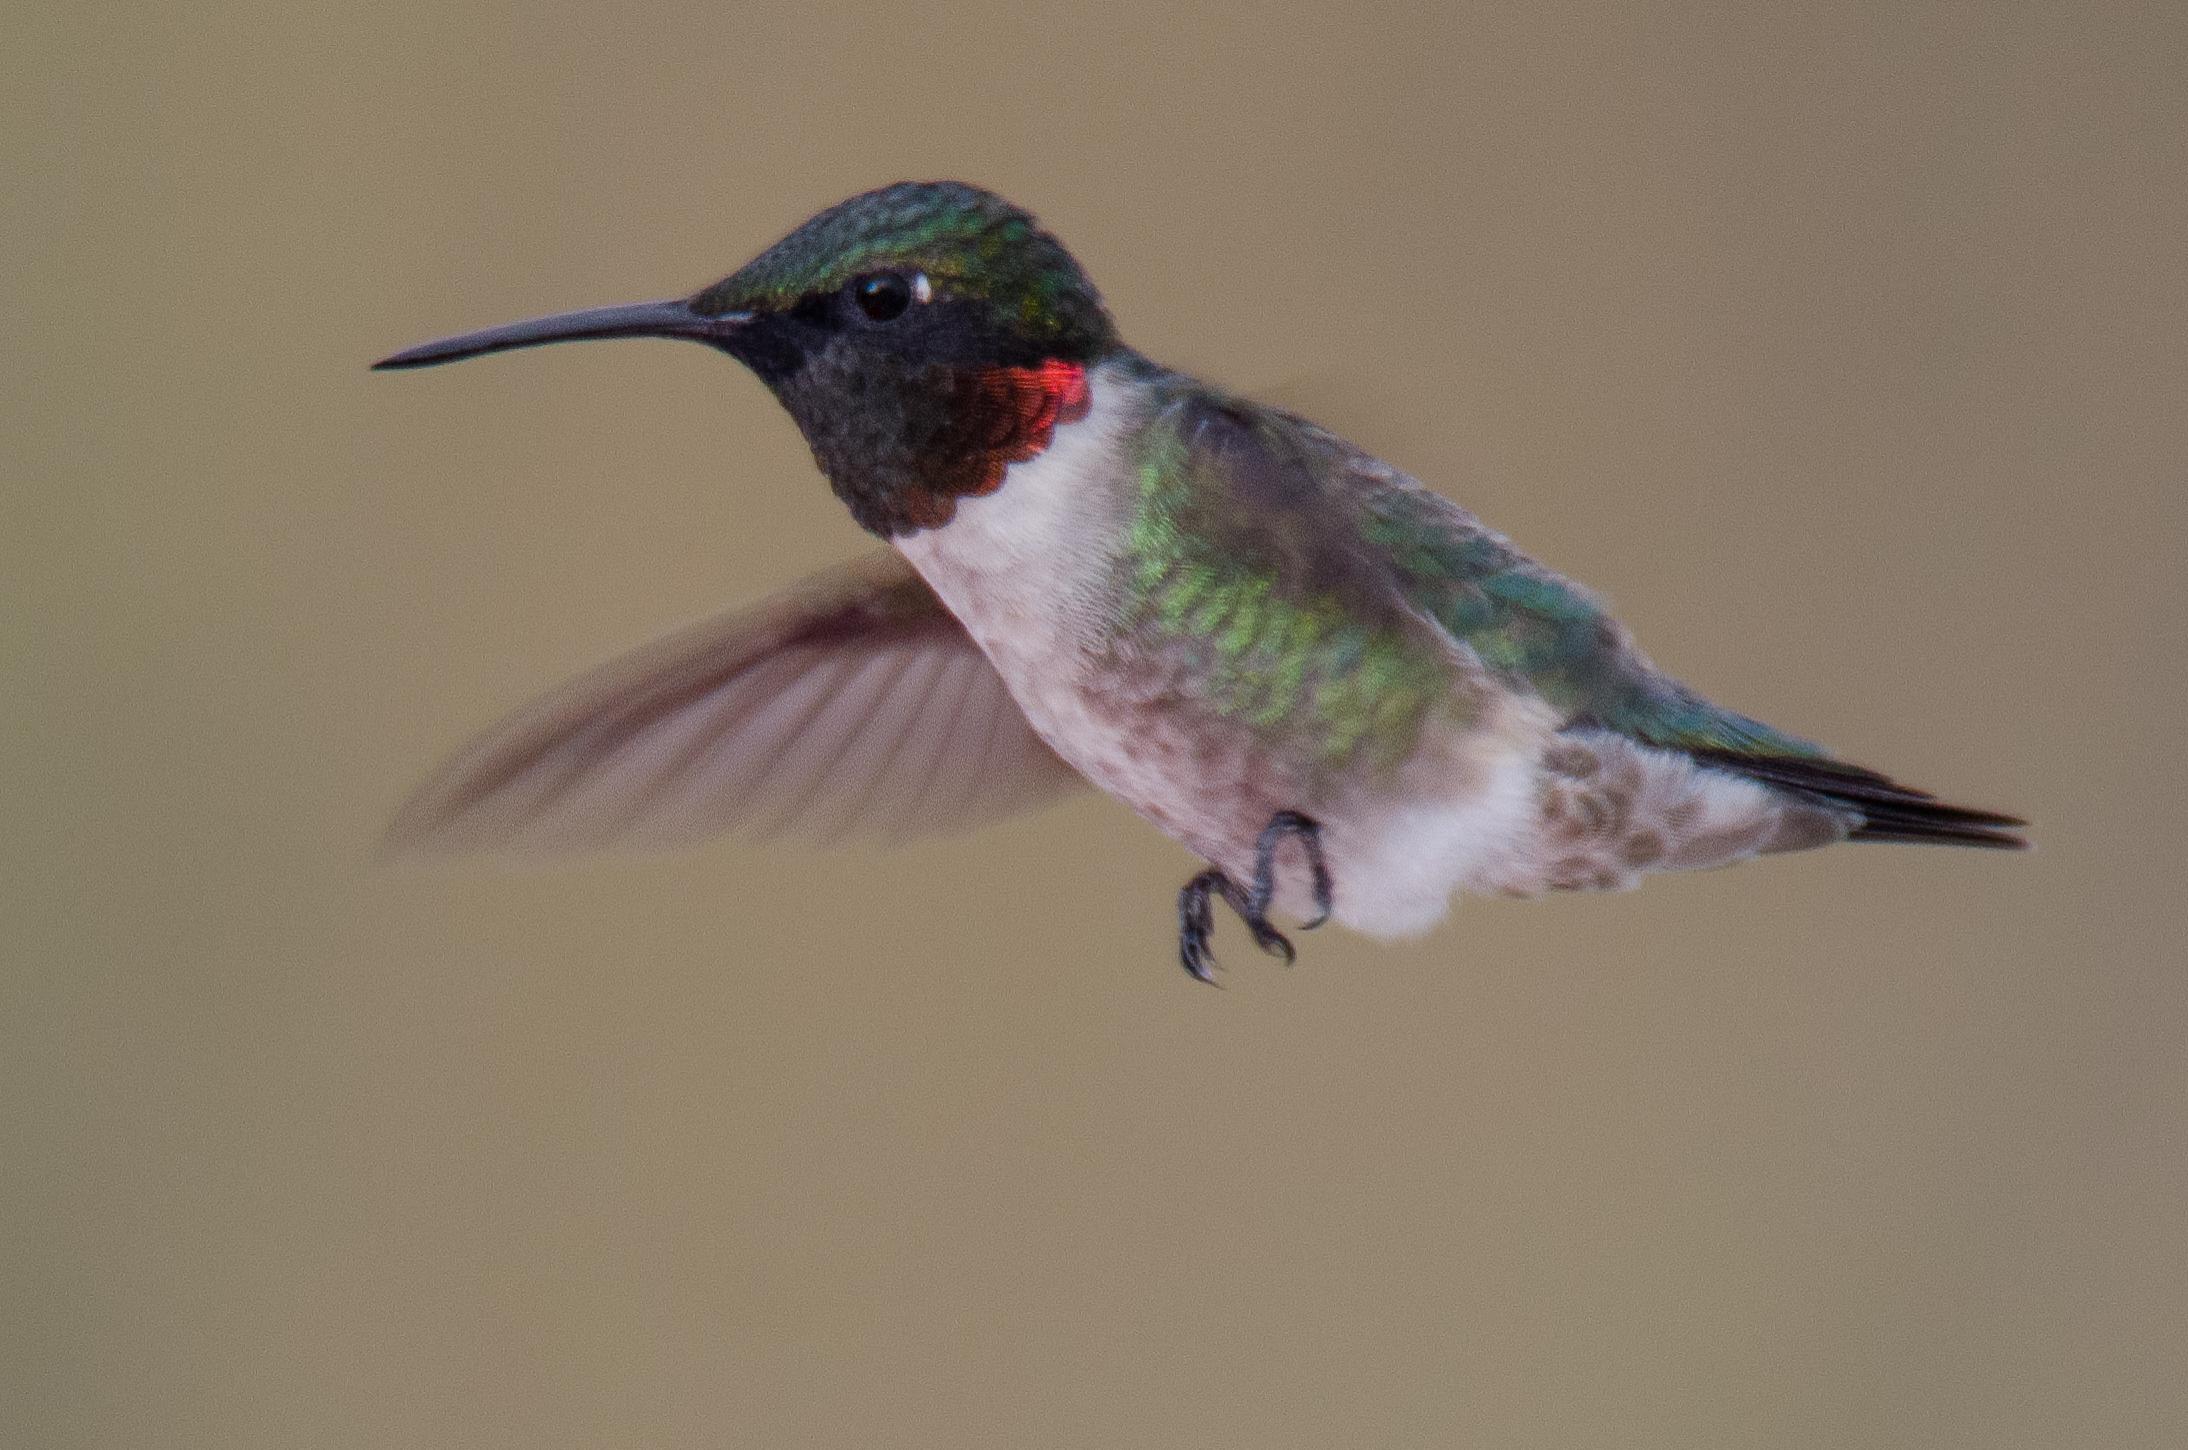 Ruby-Throated Hummingbird  Nikon D7000 ISO 400 600mm f/7.1 1/400 sec